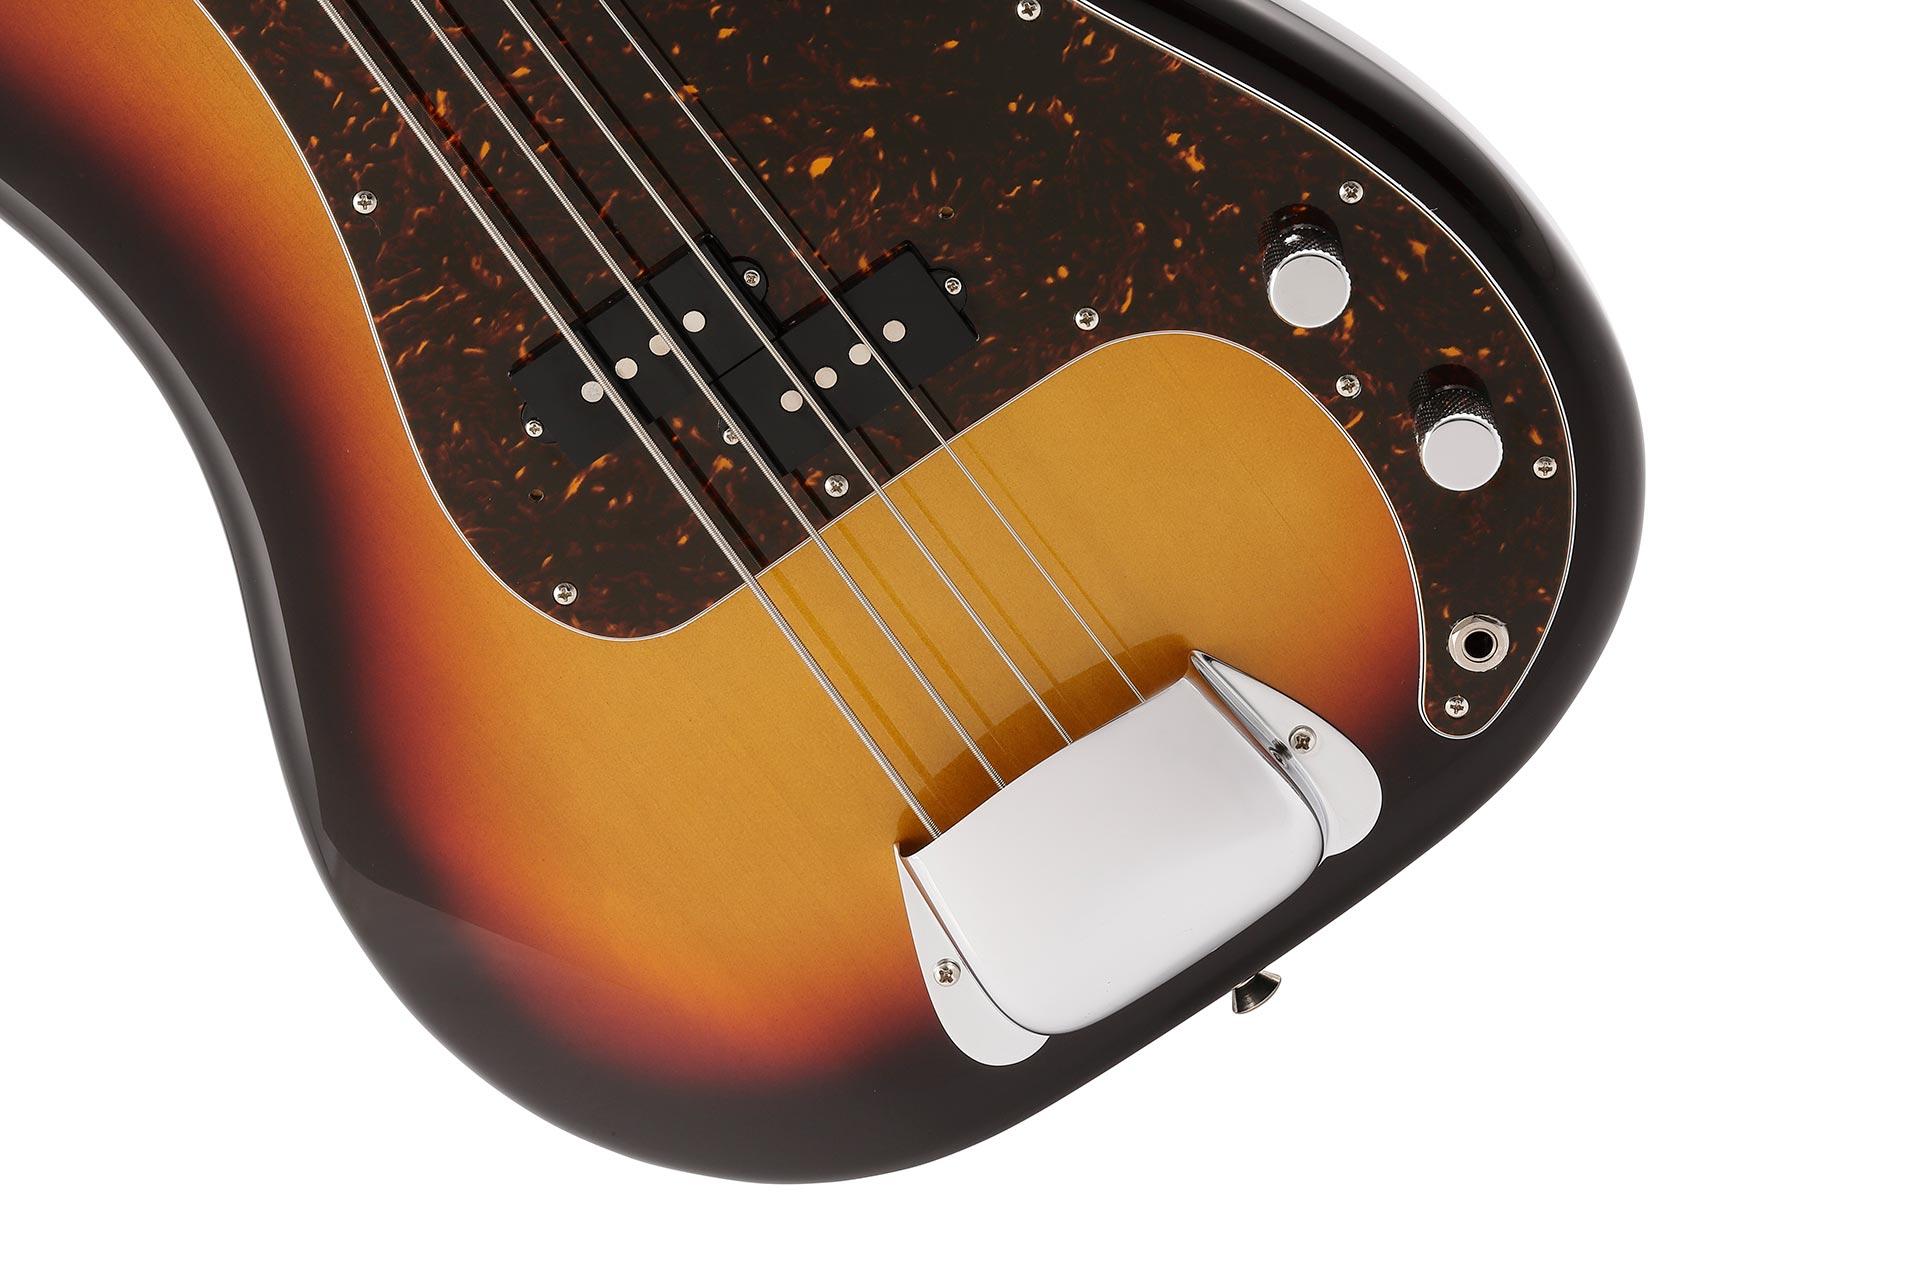 Hama Okamoto Precision Bass ブリッジ周辺